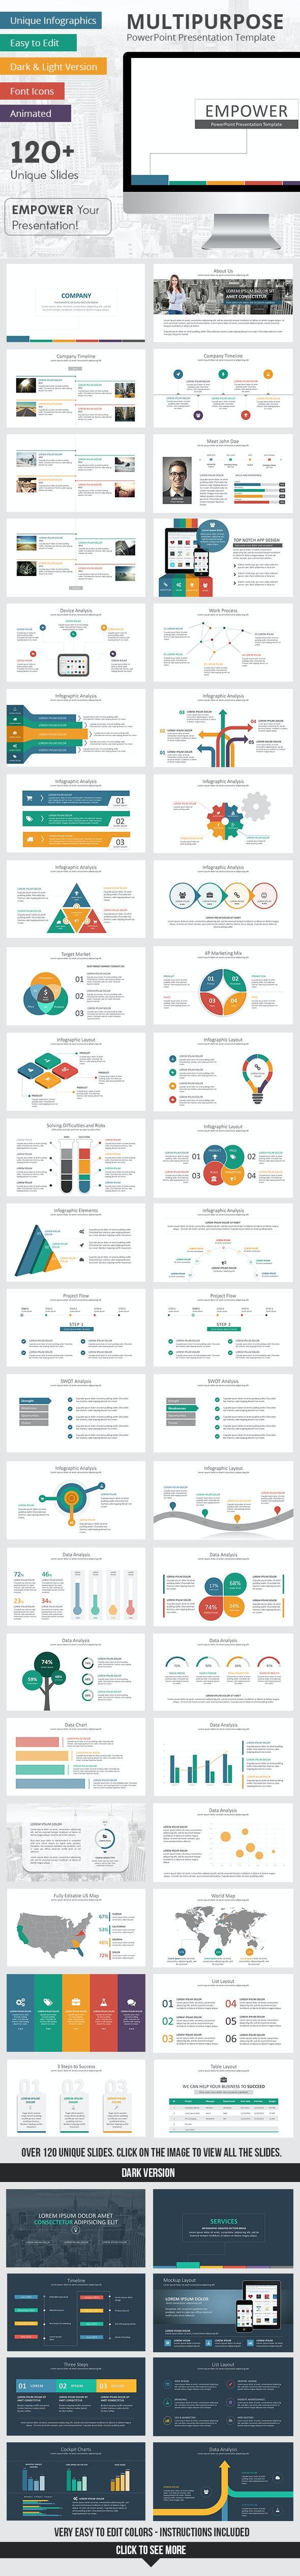 Empower PowerPoint Presentation Template - Business PowerPoint Templates